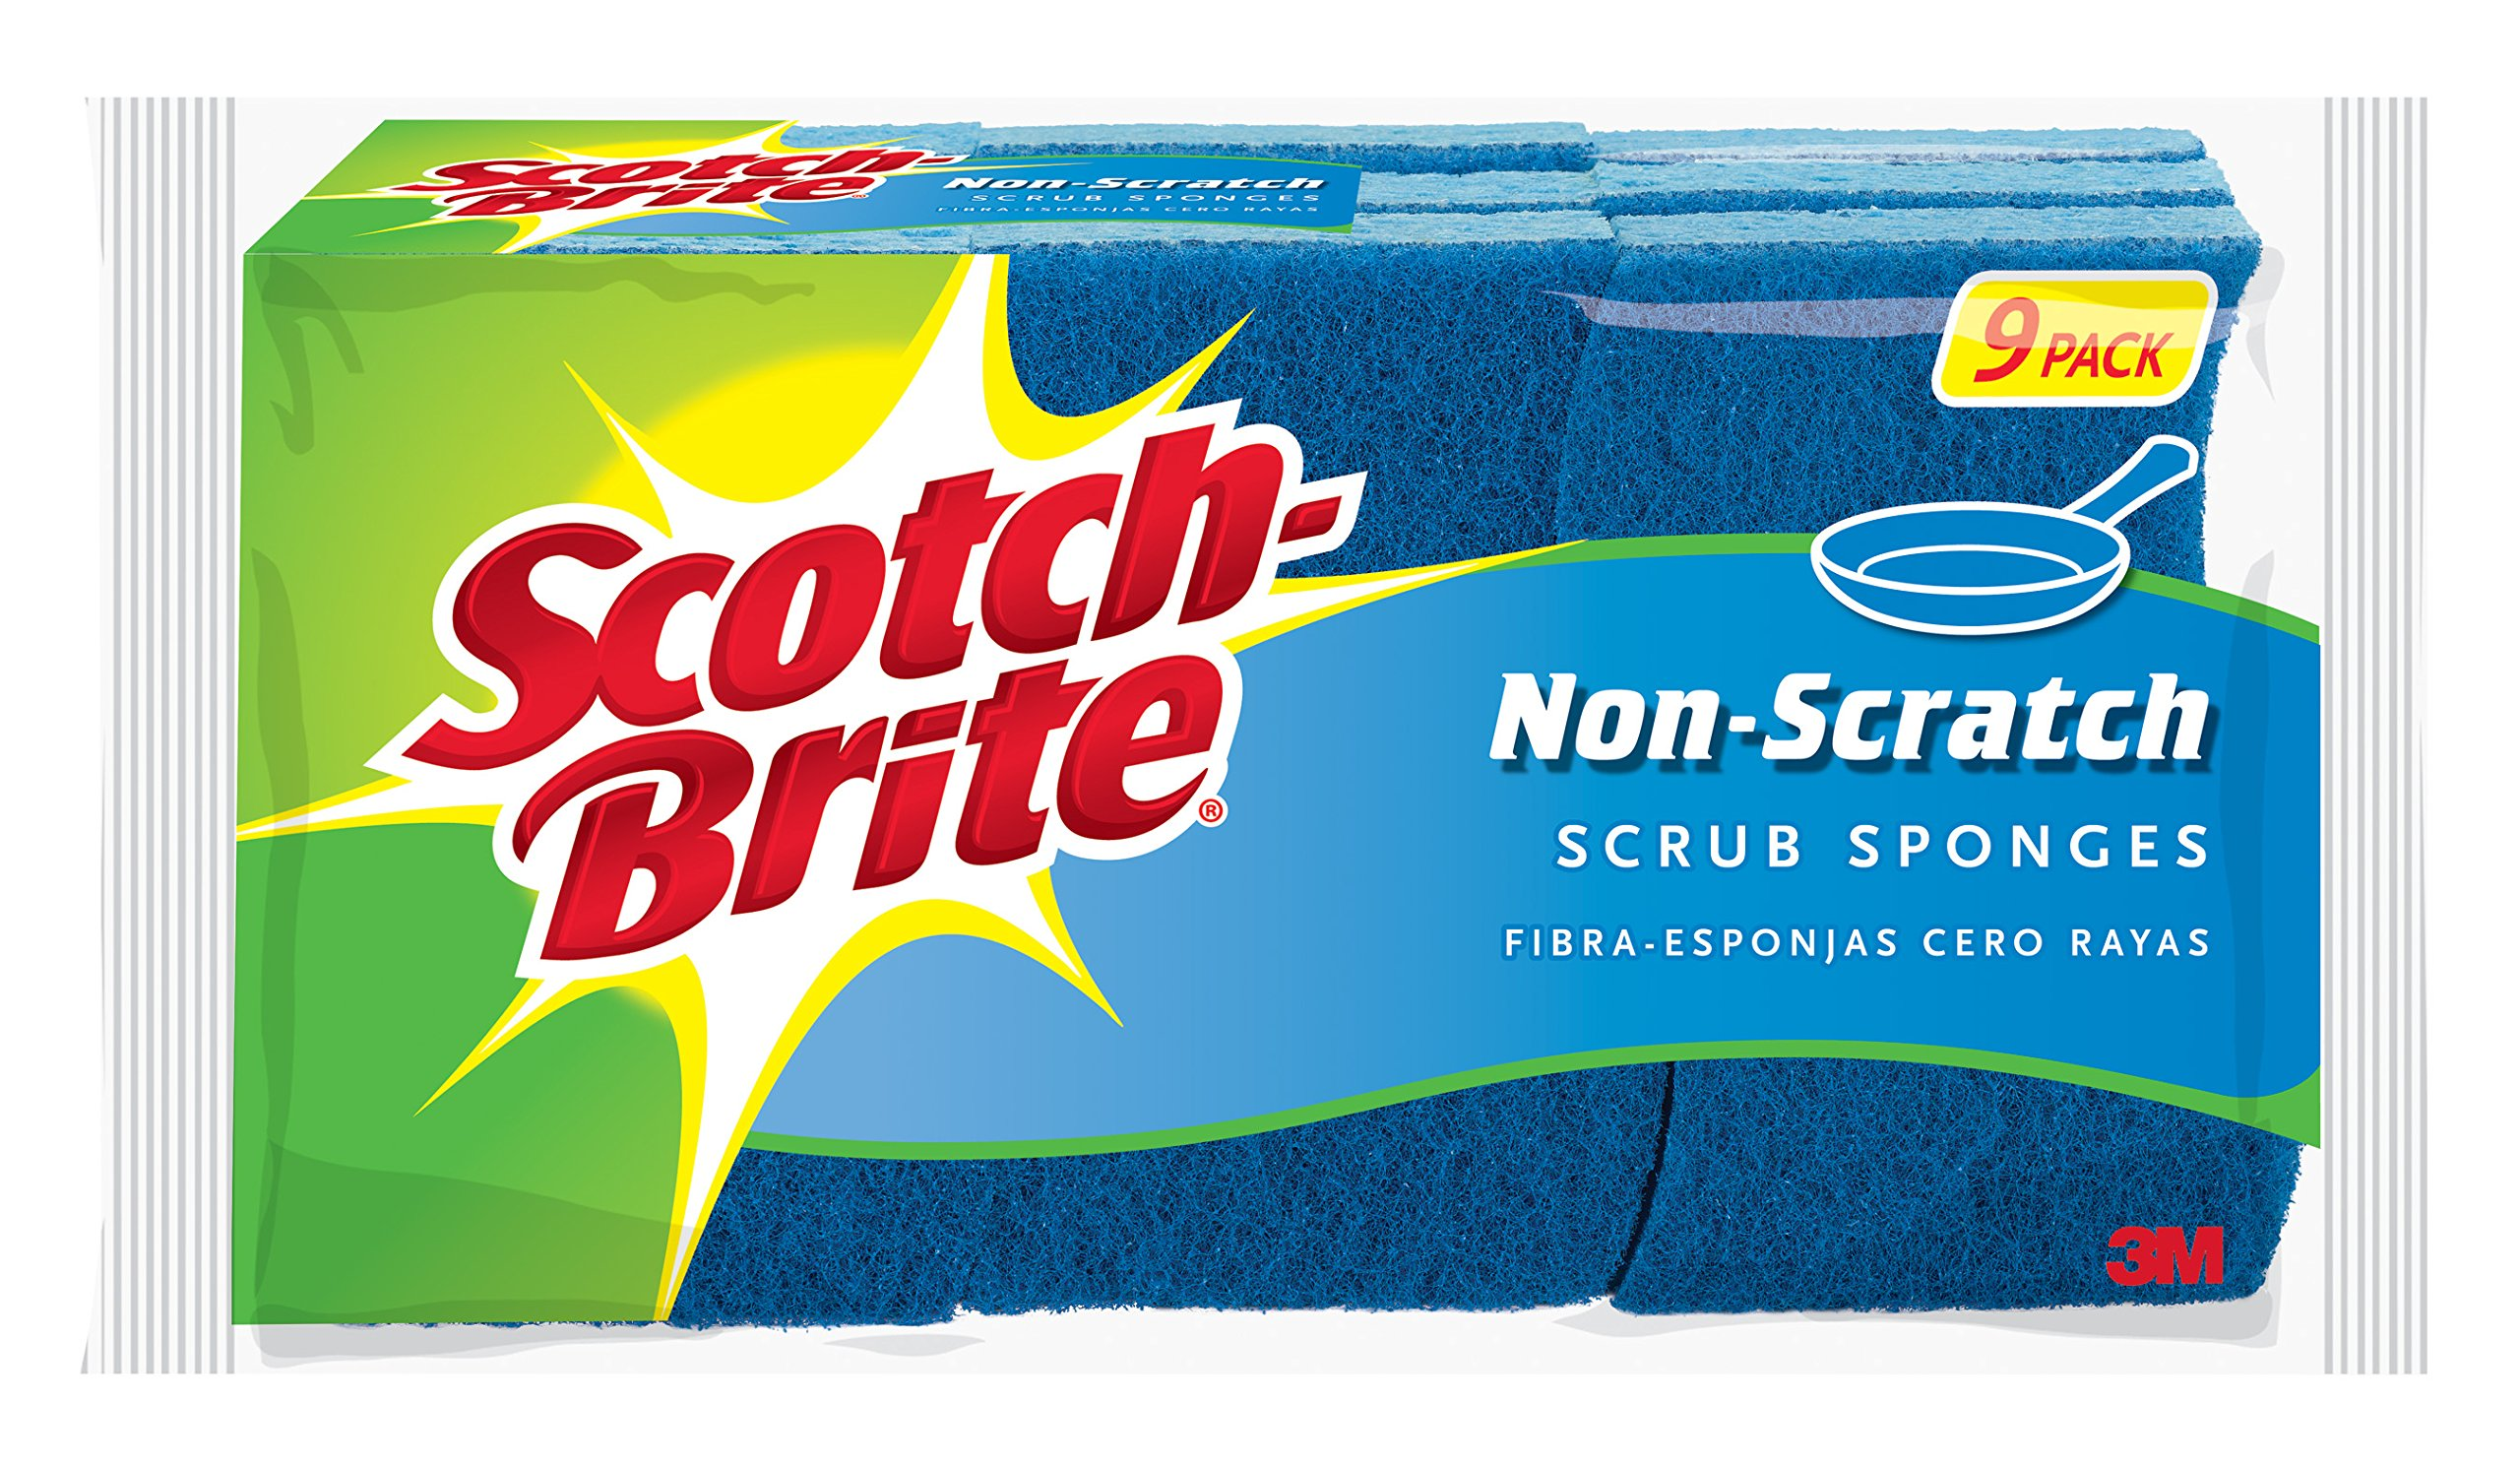 Scotch-Brite Non-Scratch Scrub Sponge, Clean Tough Messes Without Scratching - 9 Sponges Total